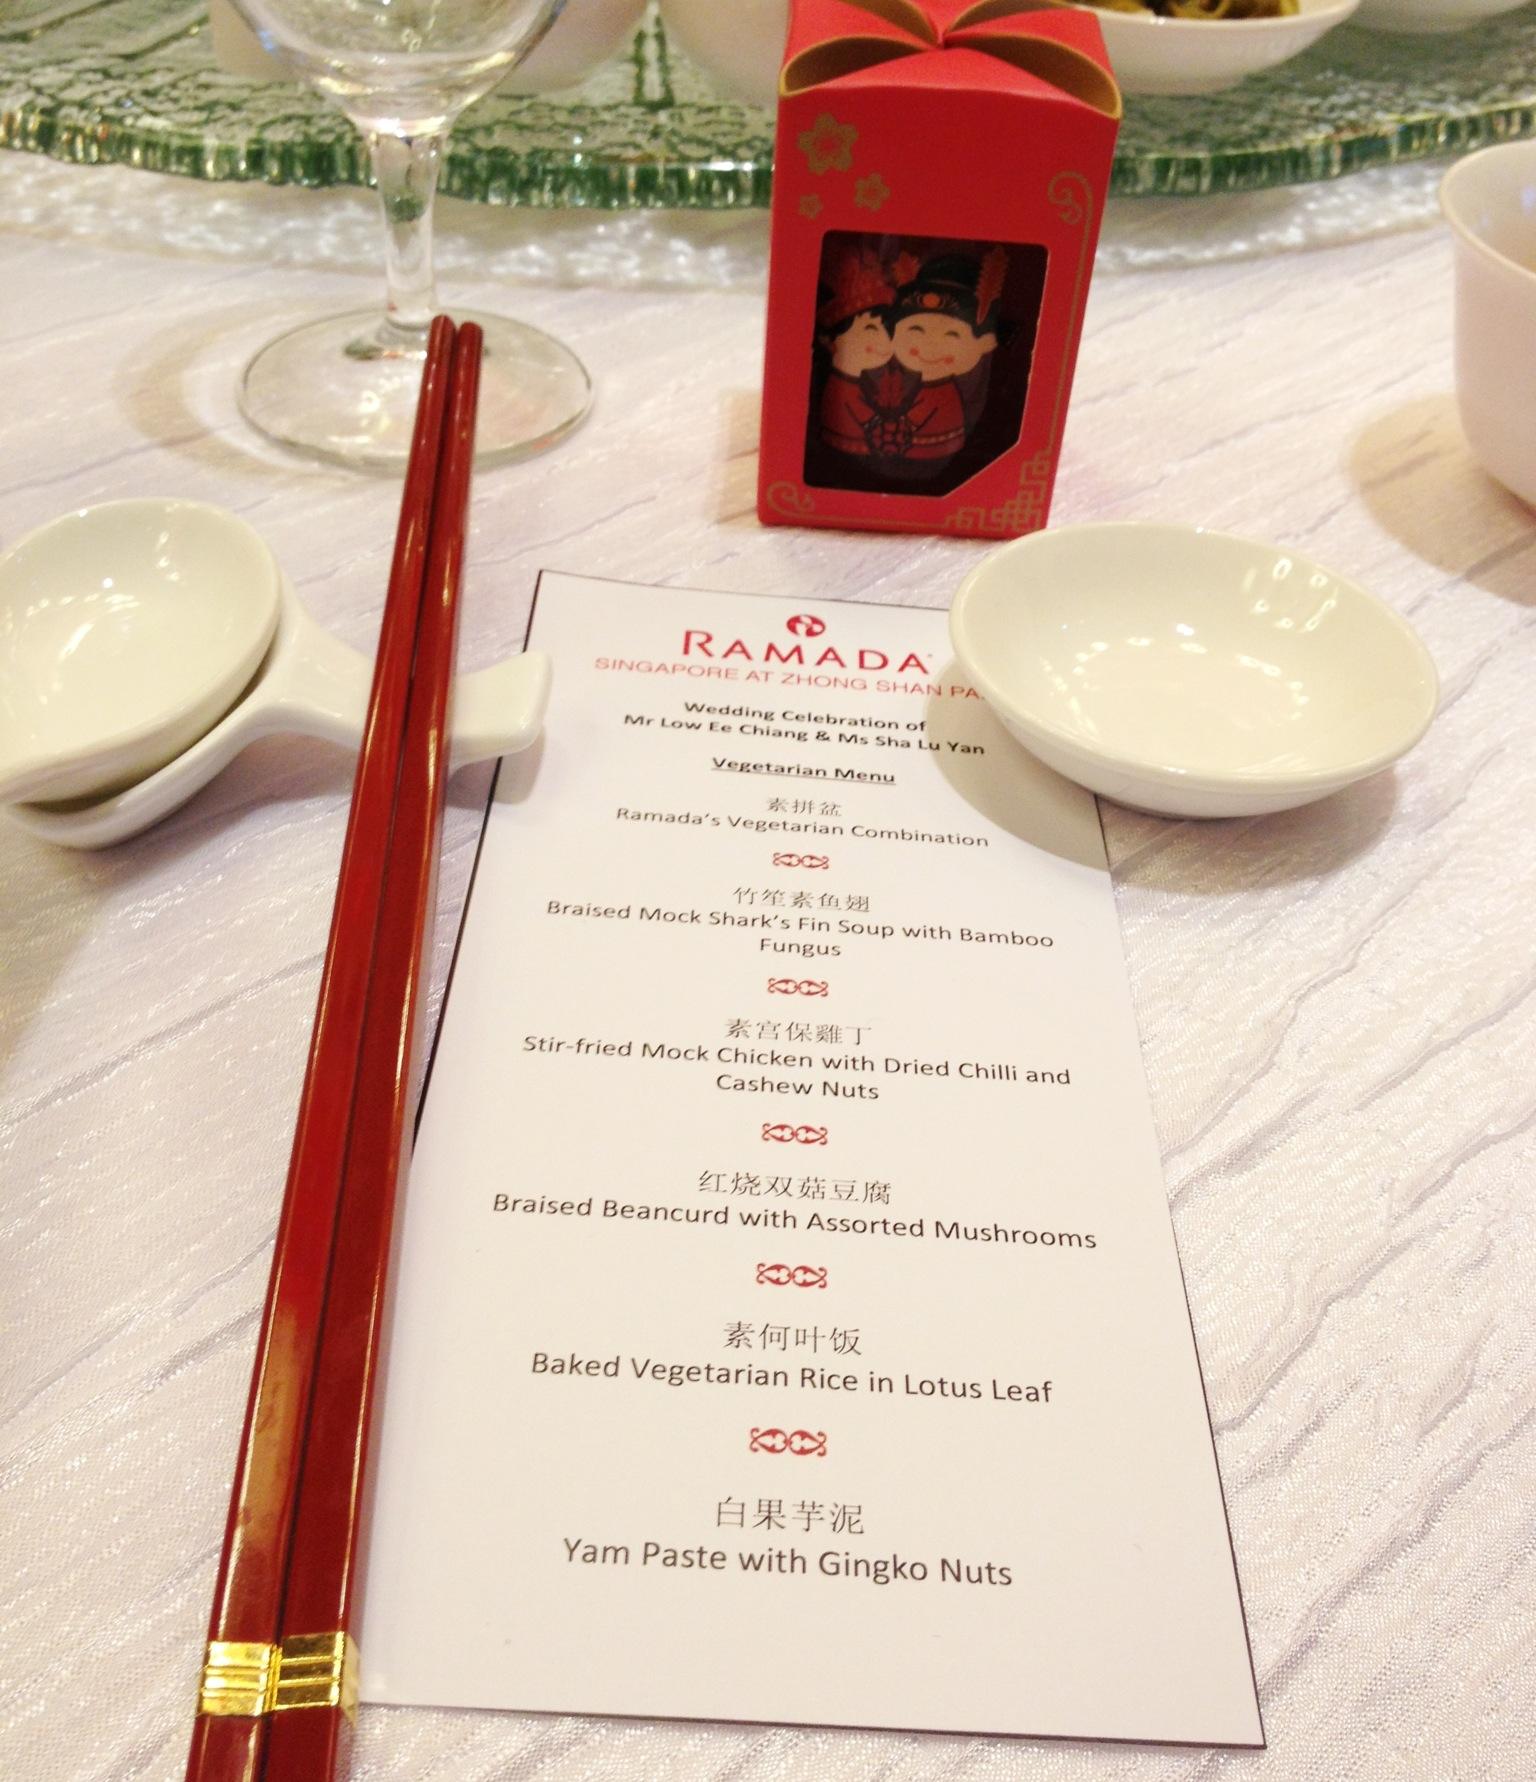 Chinese Wedding Food Menu: Vegetarian Wedding Menu